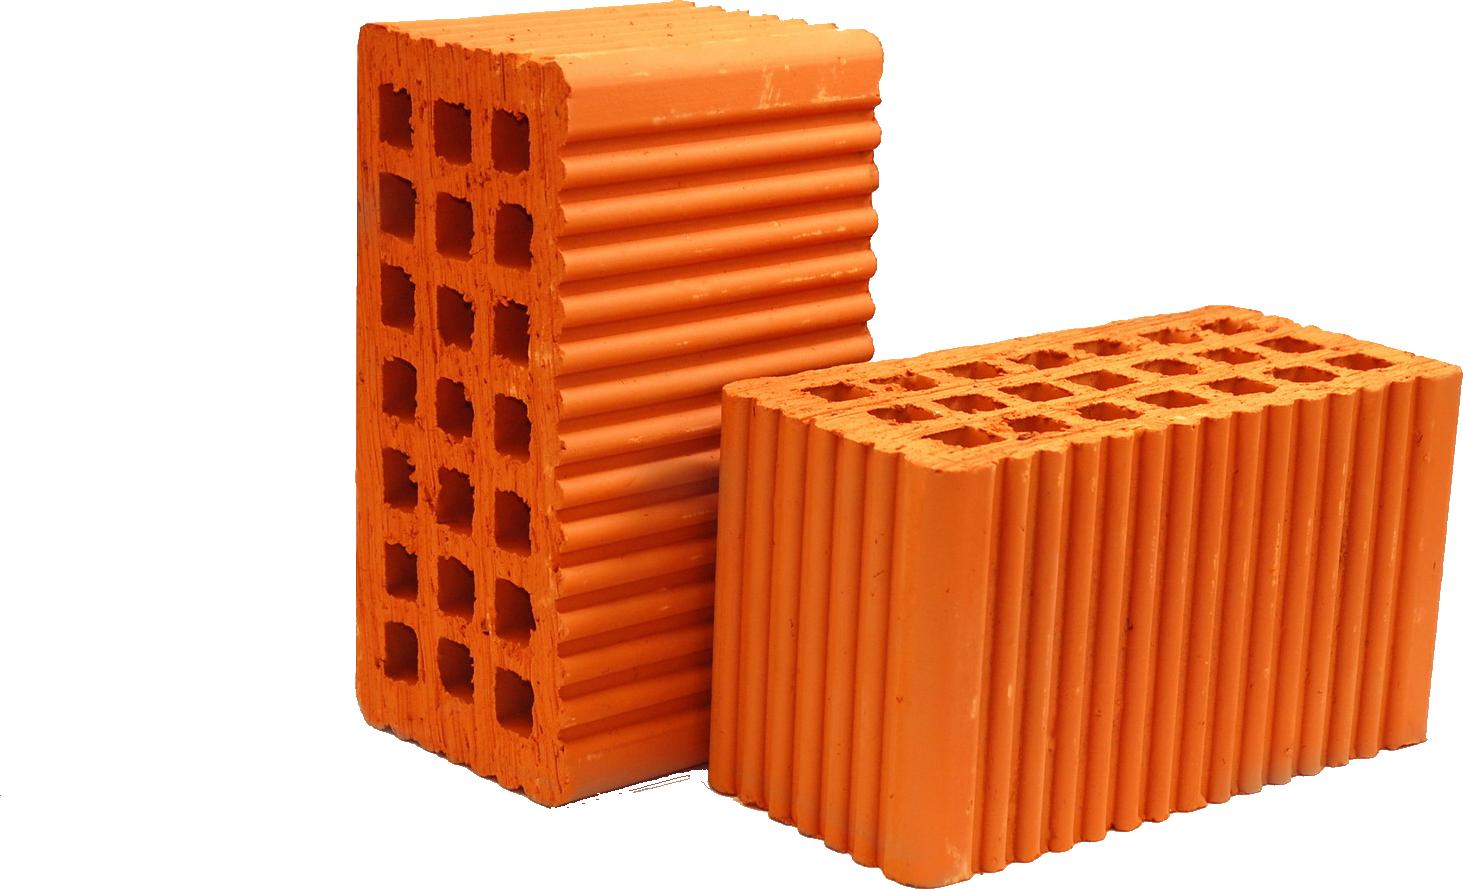 Brick Png image #39829